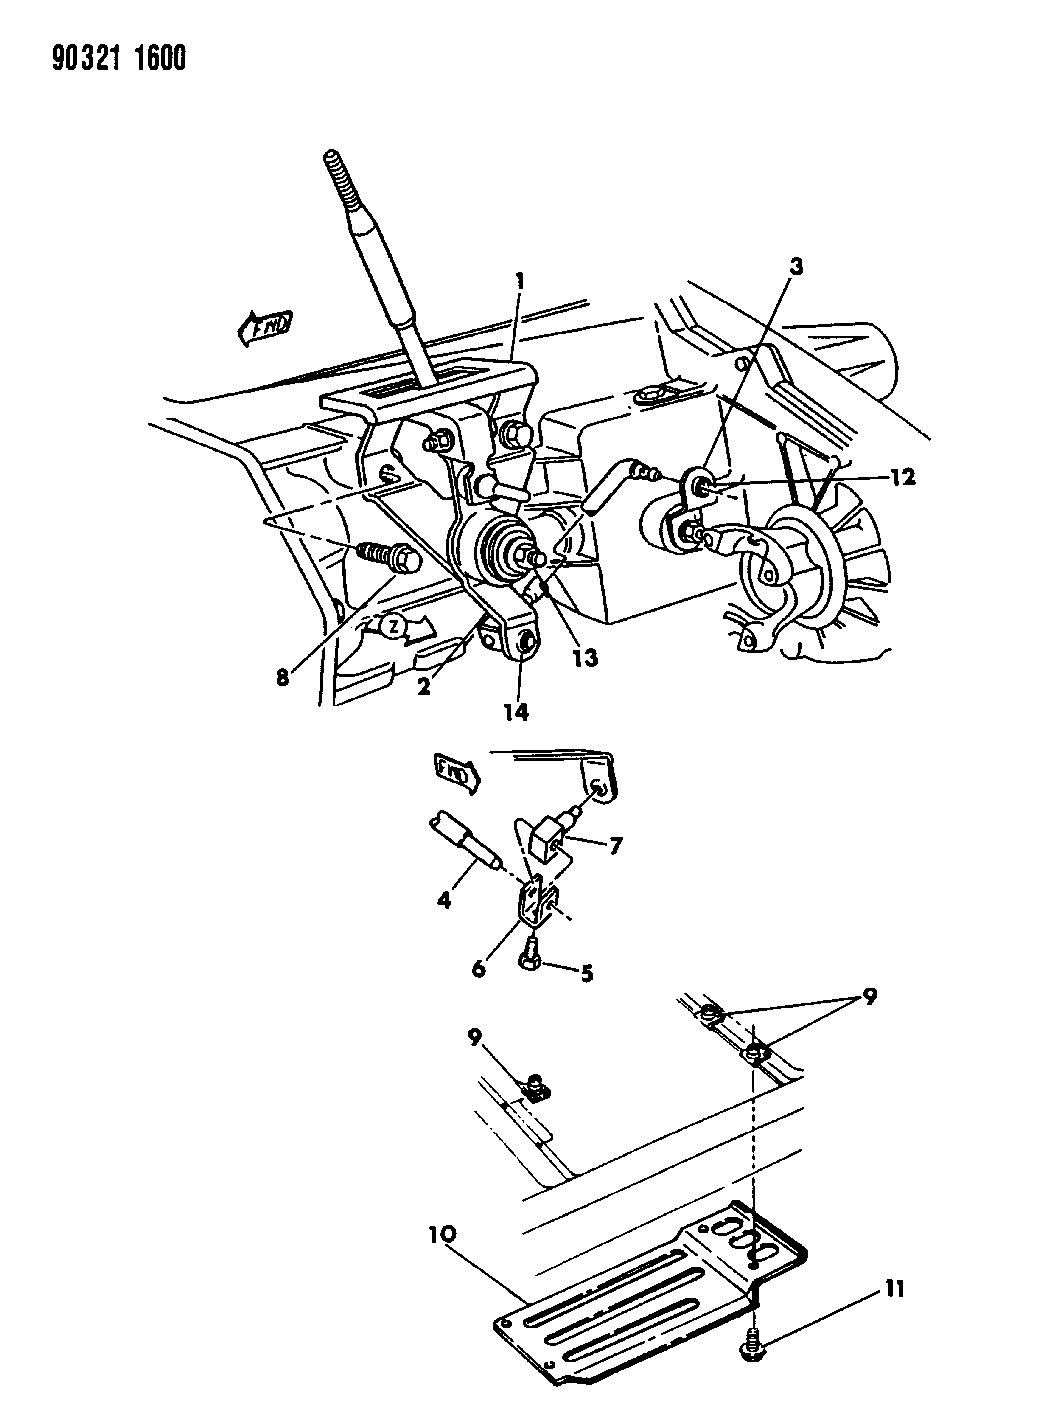 1993 Dodge Dakota Controls & Mounting, Transfer Case